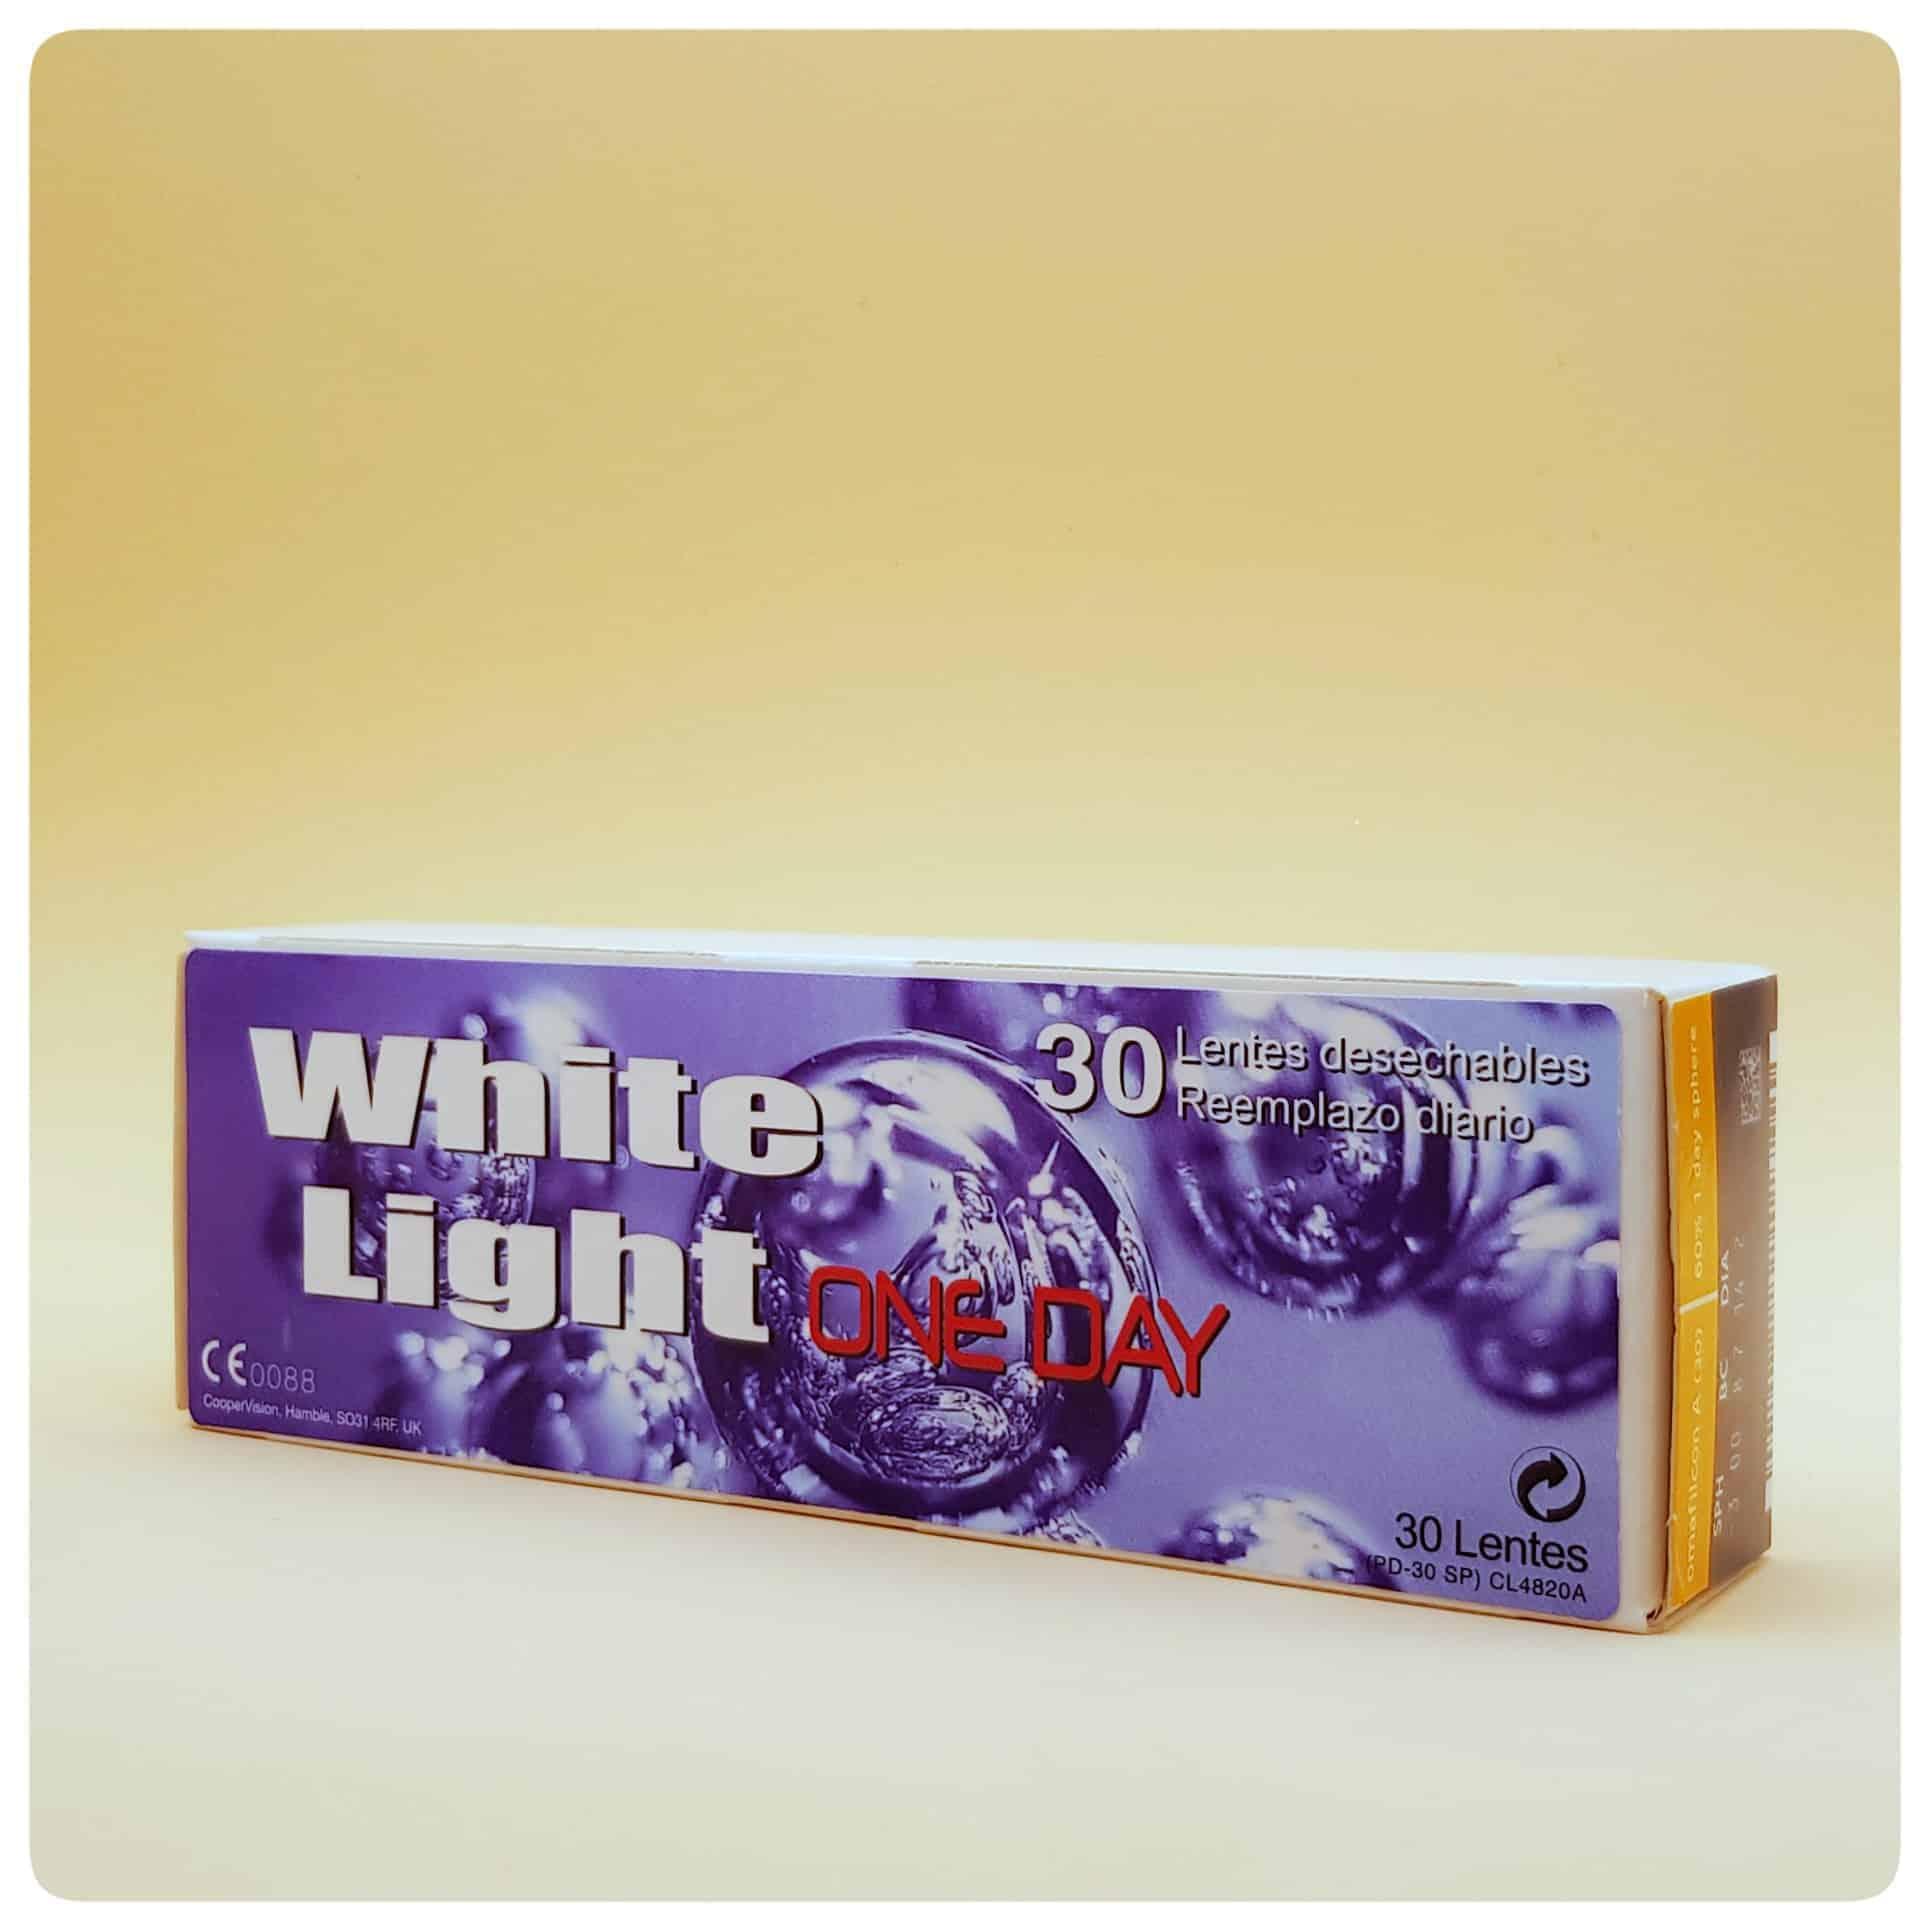 Lentillas White Light One Day